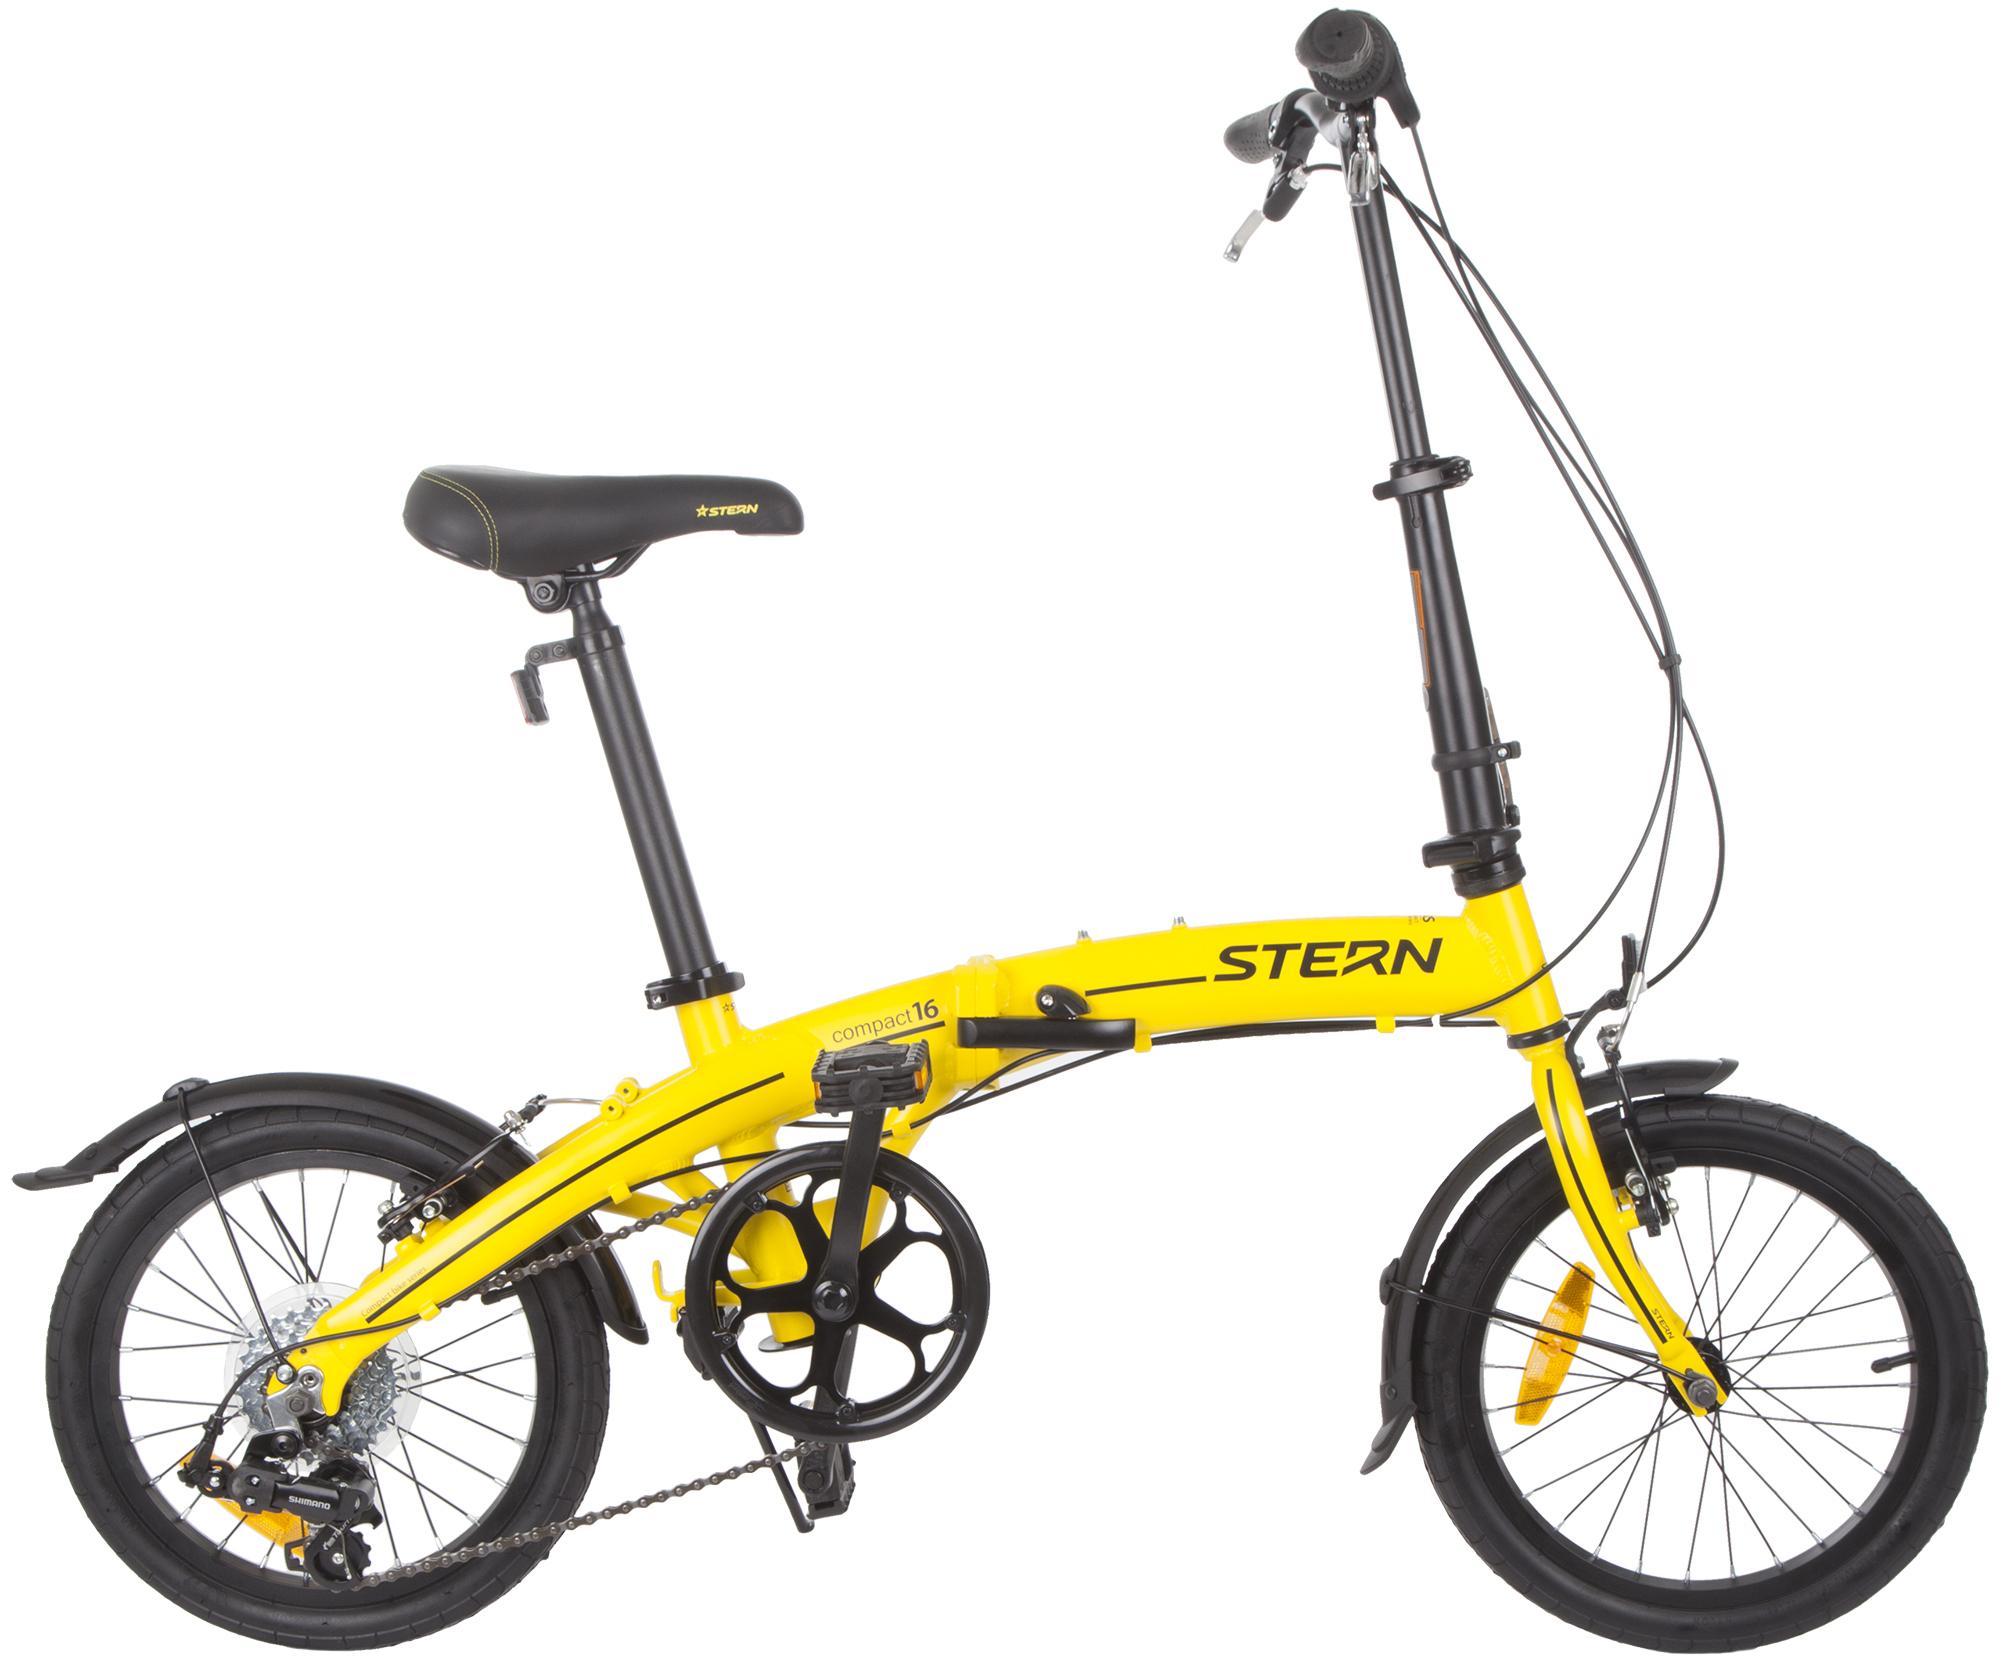 Stern Велосипед складной Stern Compact 16 цена